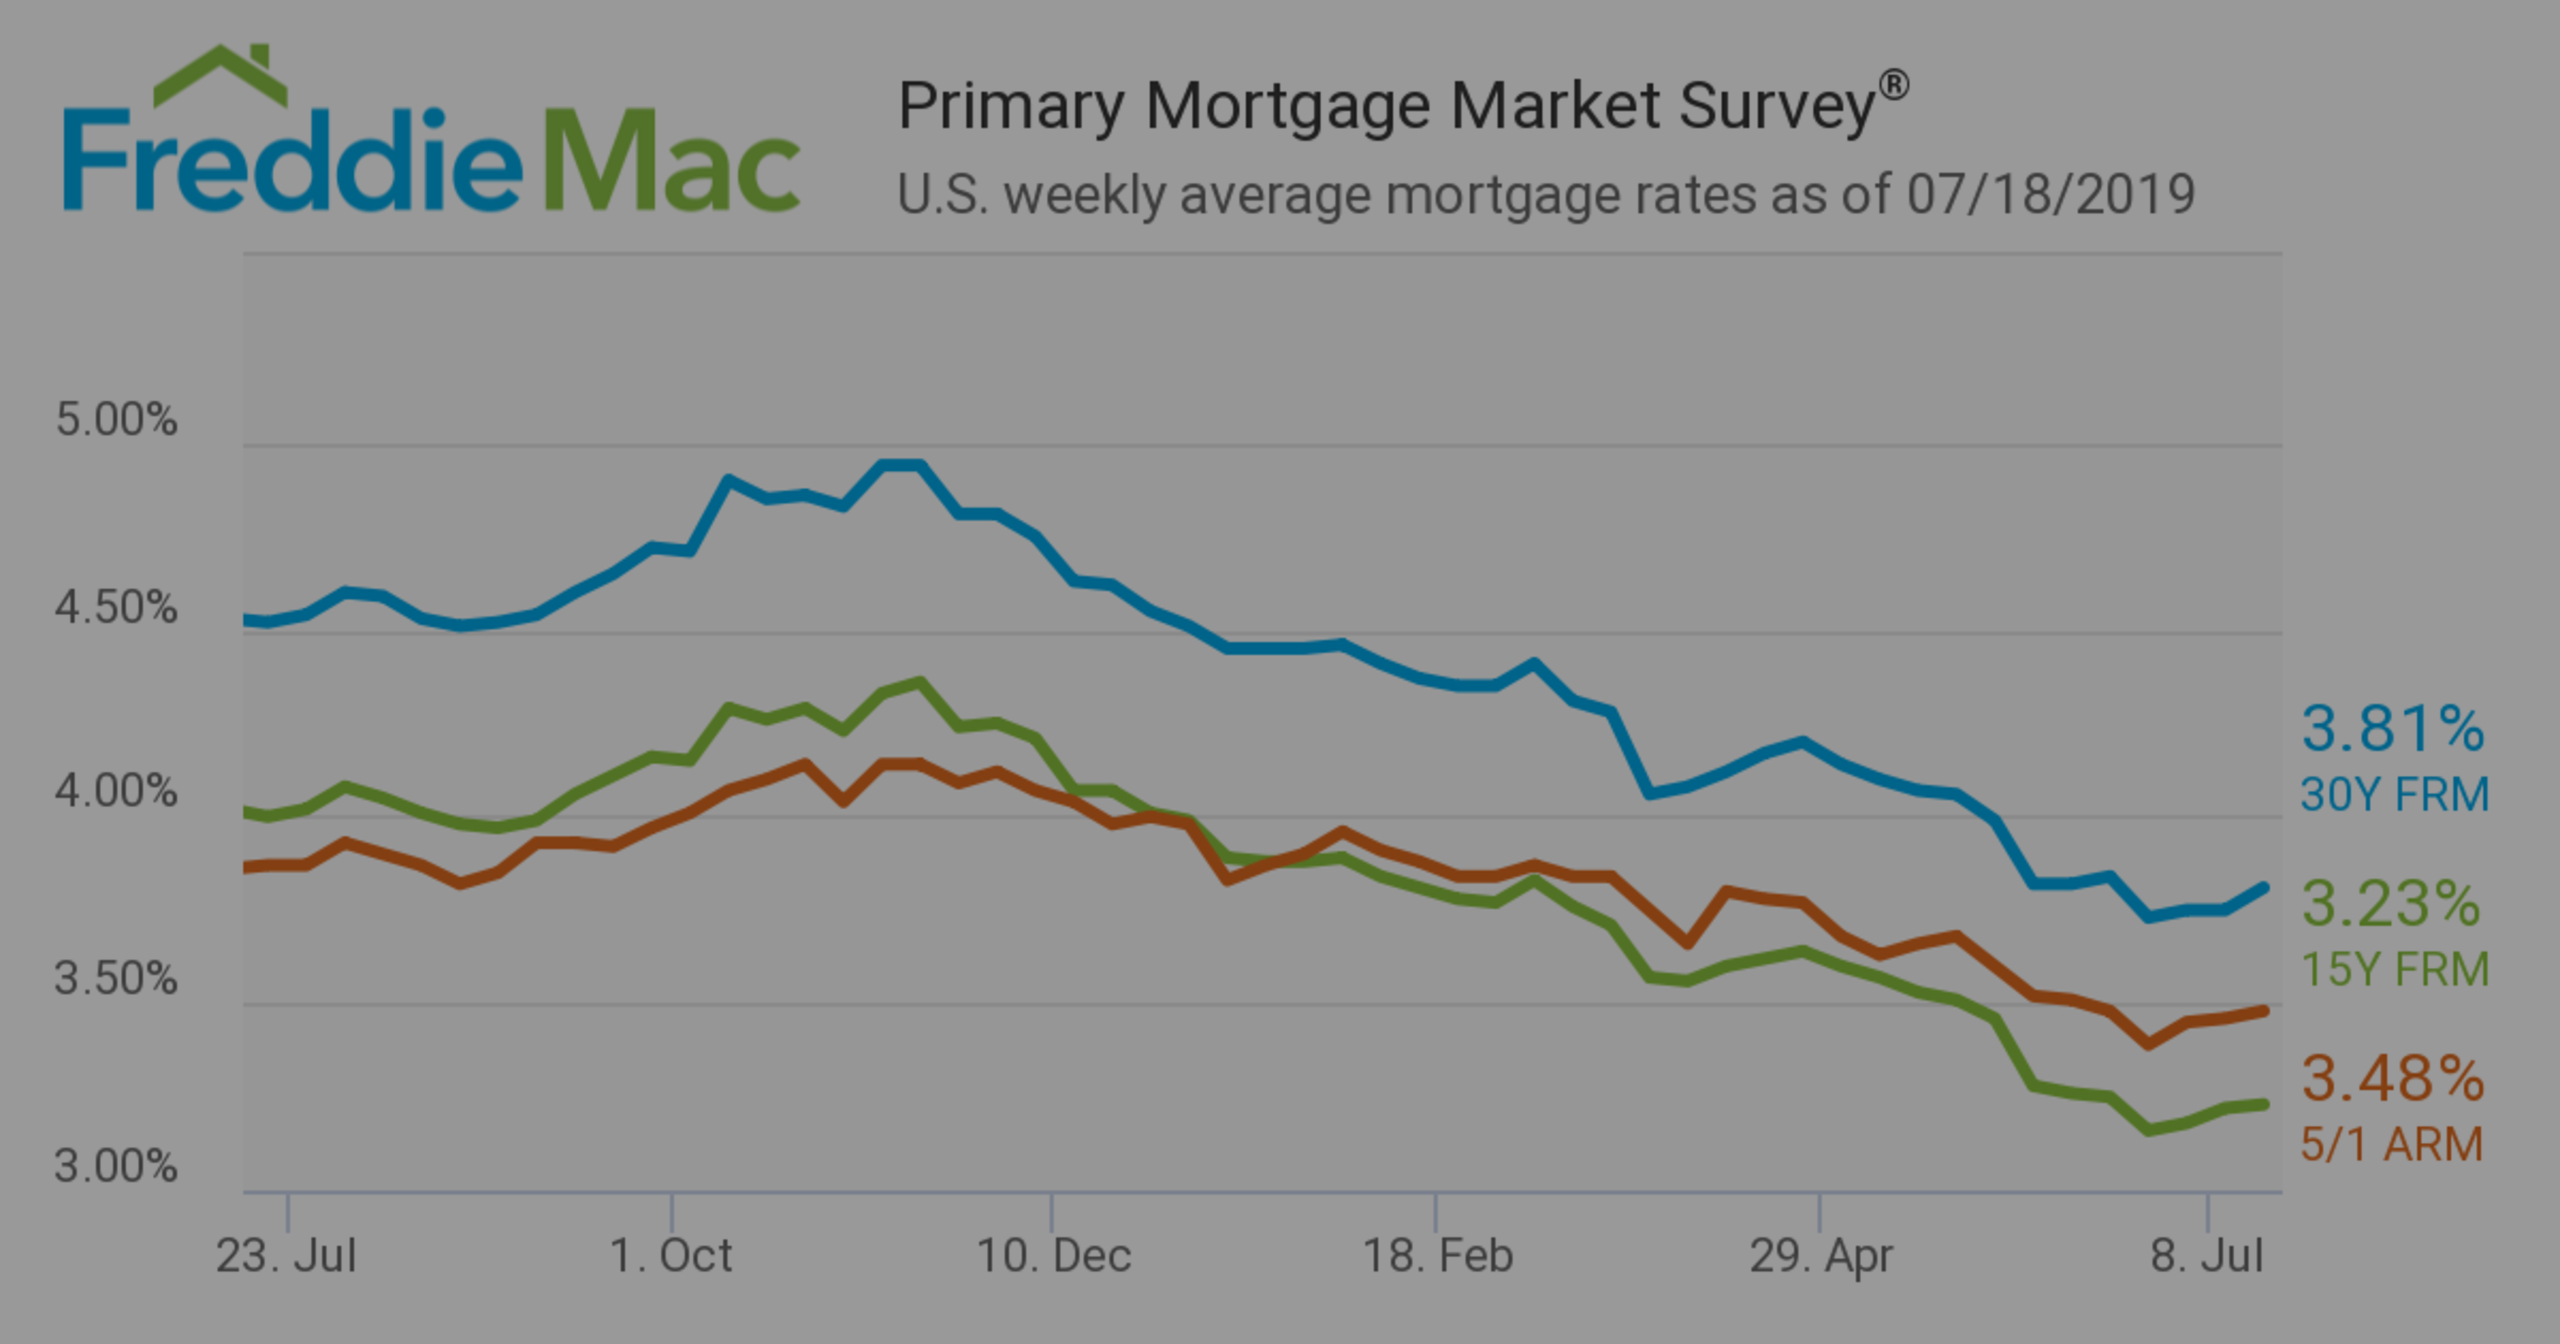 Weekly mortgage rates trending upward